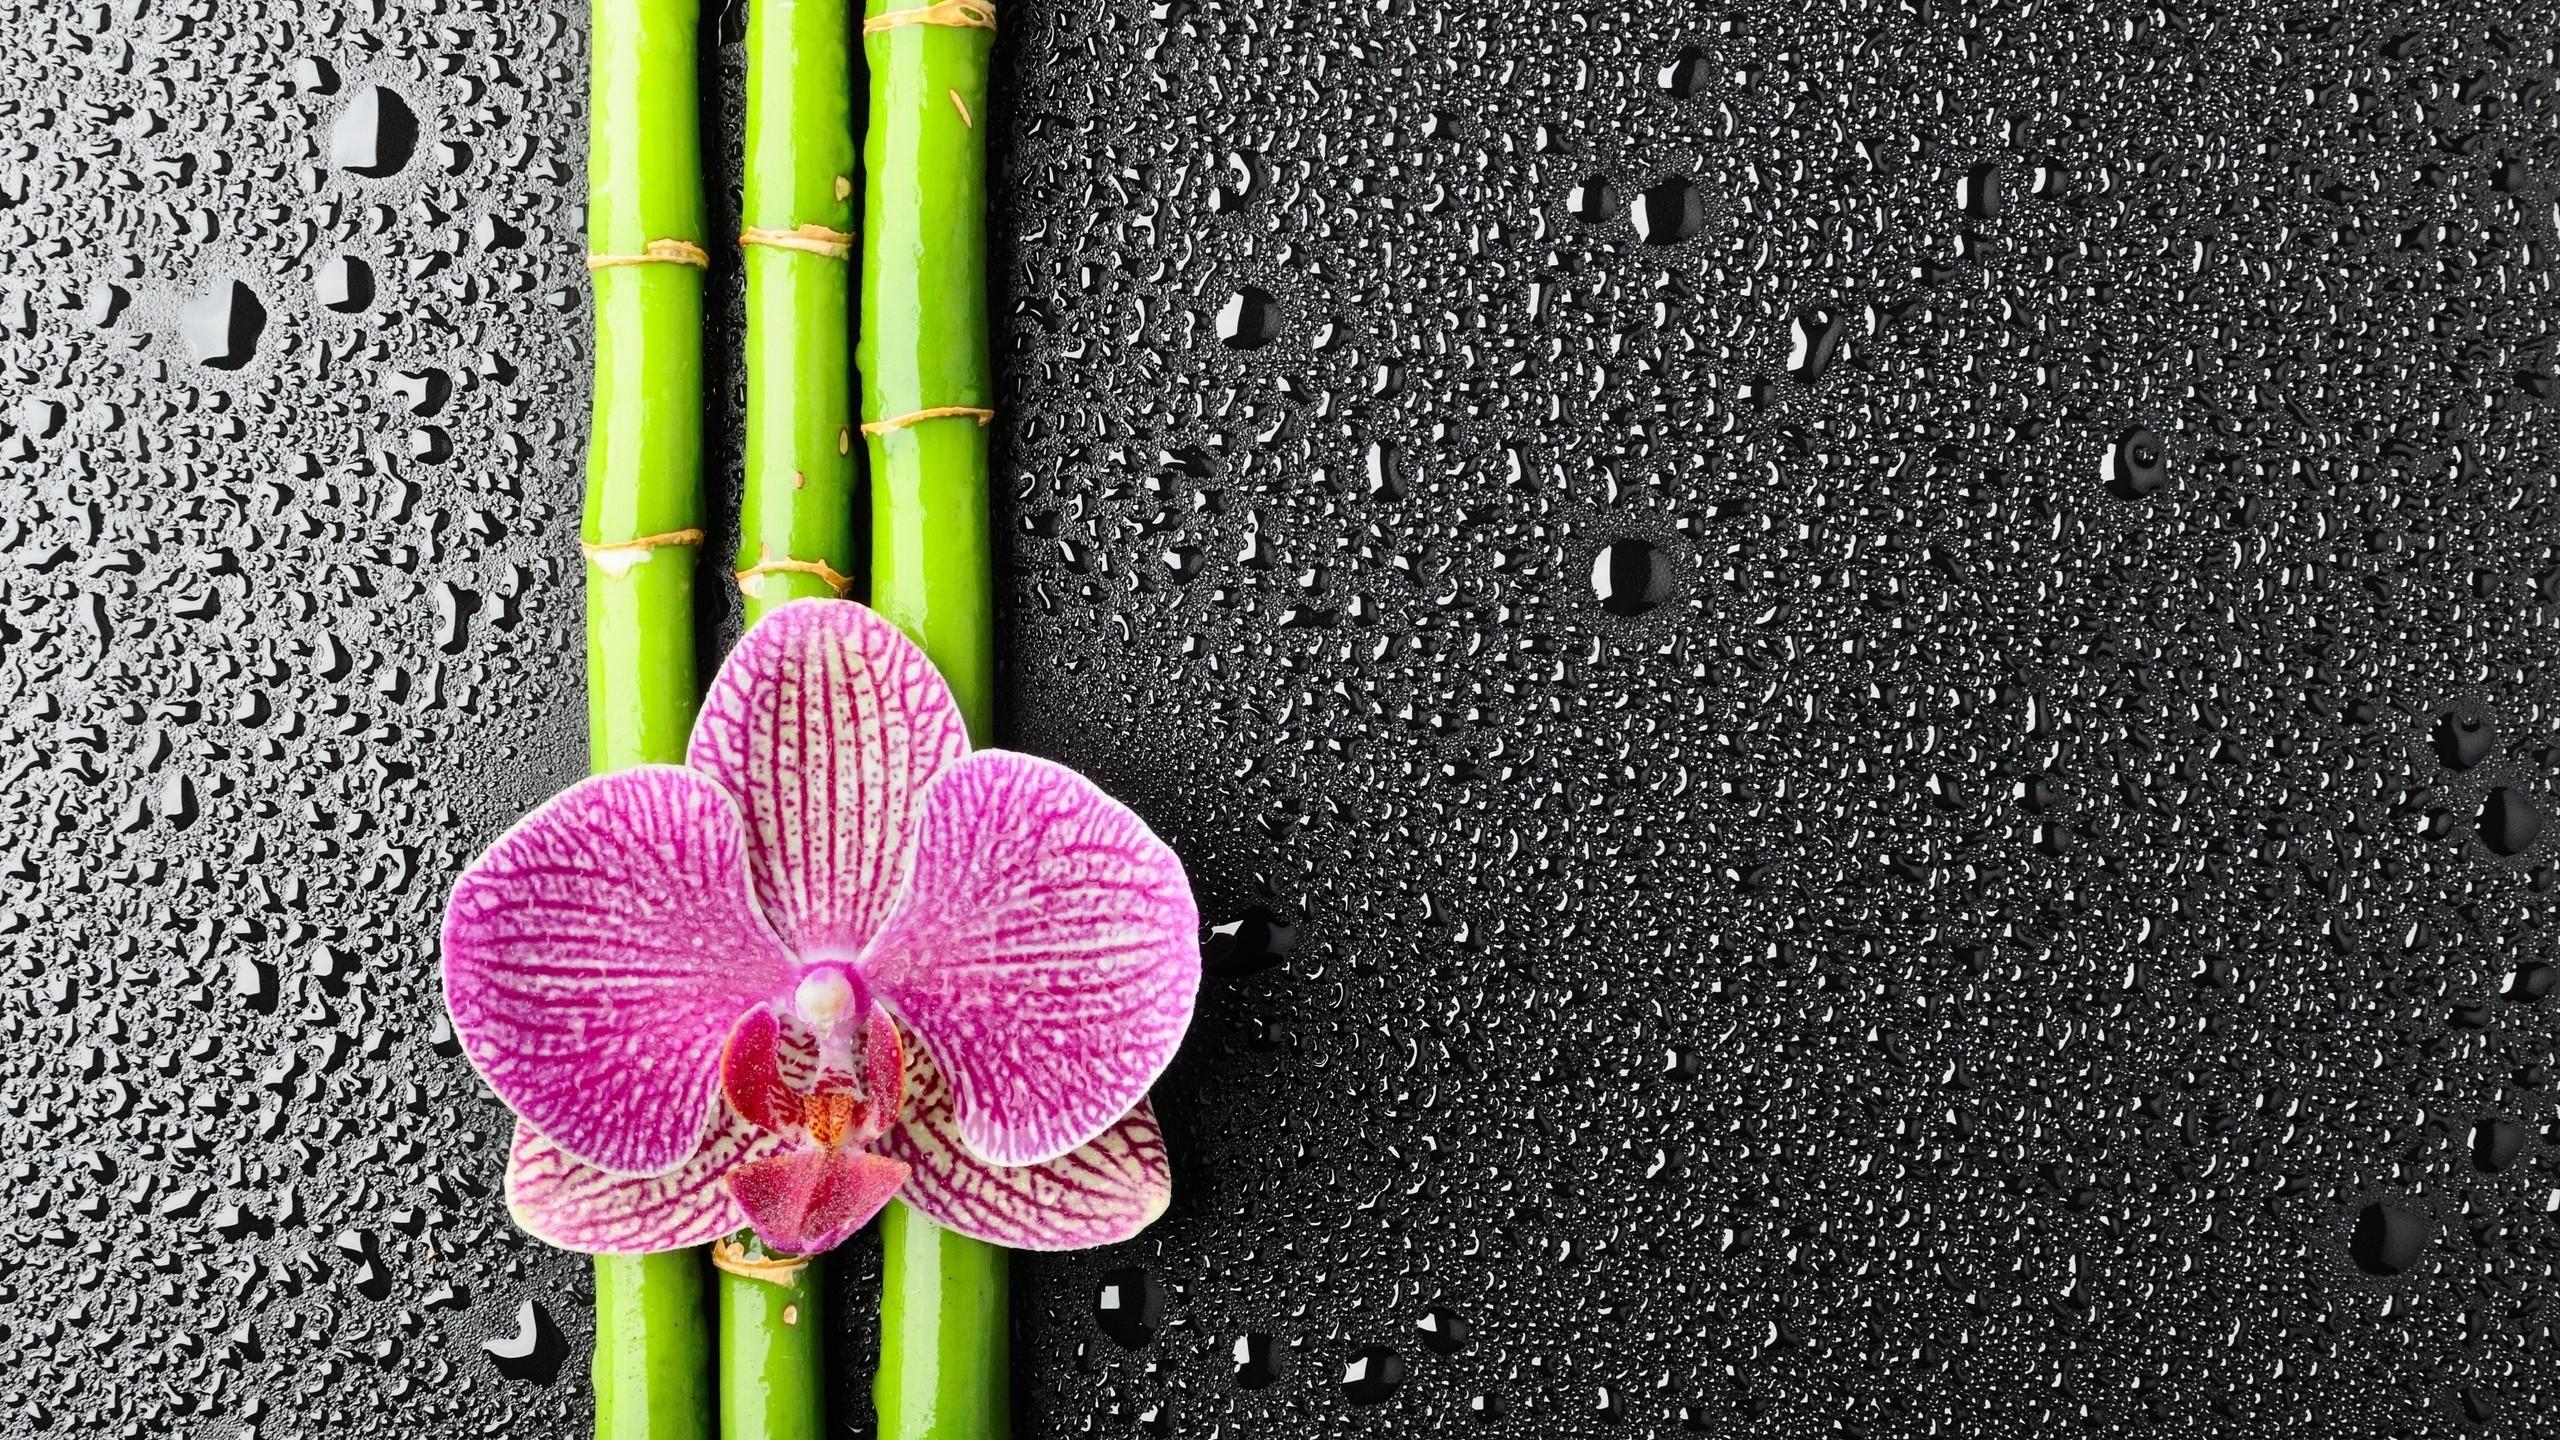 Fondos De Pantalla Flores Orquideas Plantas Gotas De Agua